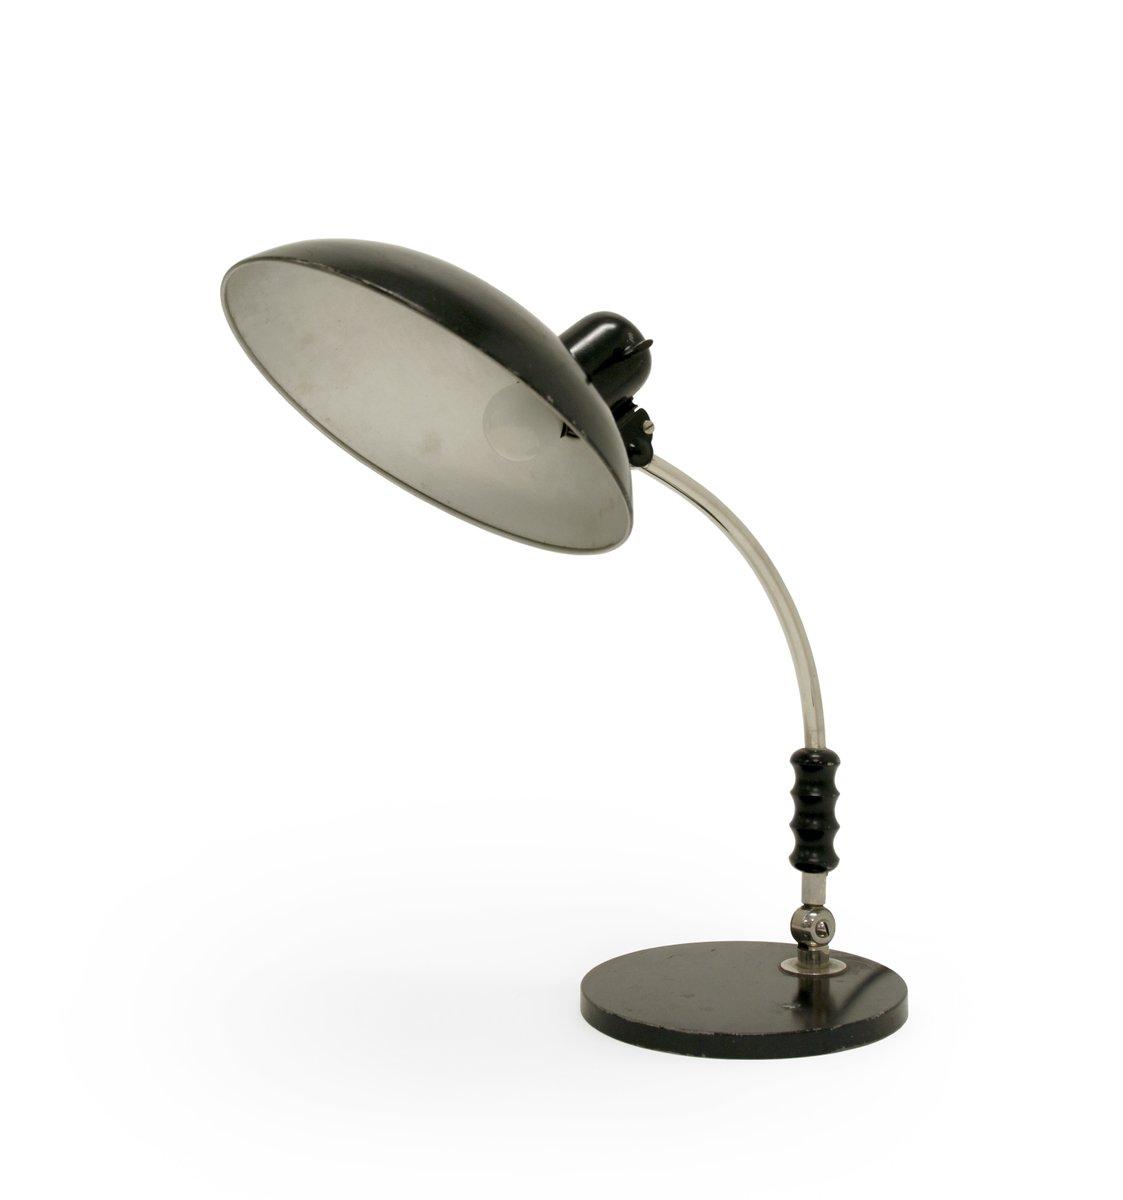 Skandinavische Tischlampe von Høvik Verk, 1930er